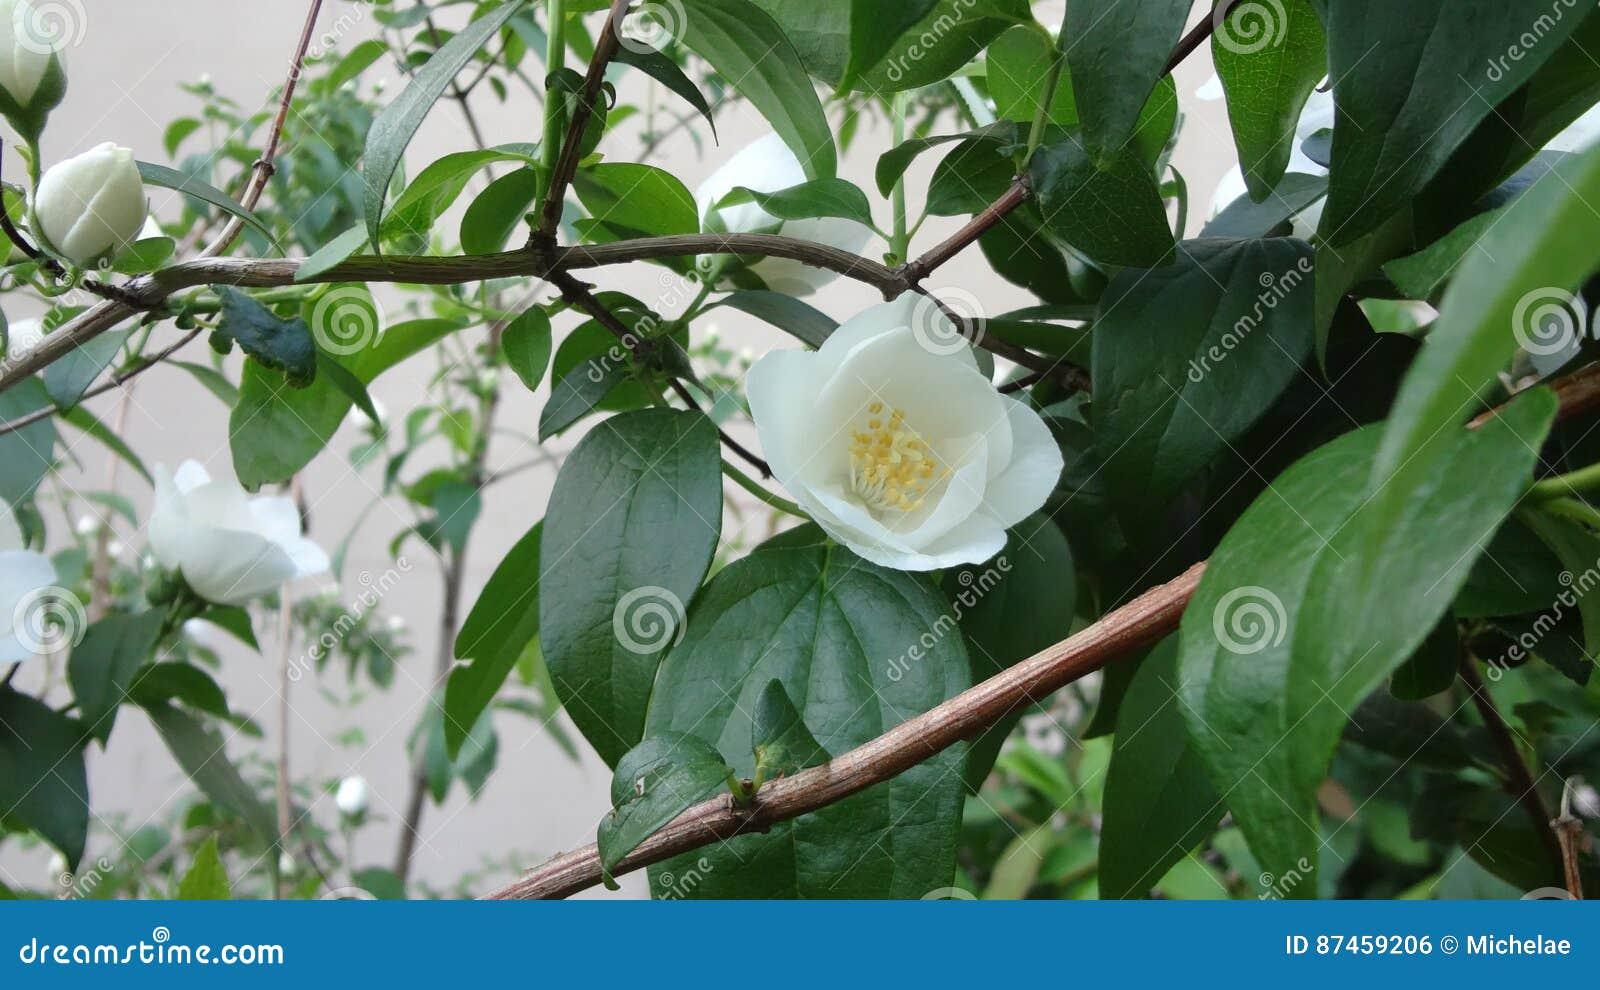 White Flowers Purity Stock Photo Image Of Symbols Petals 87459206